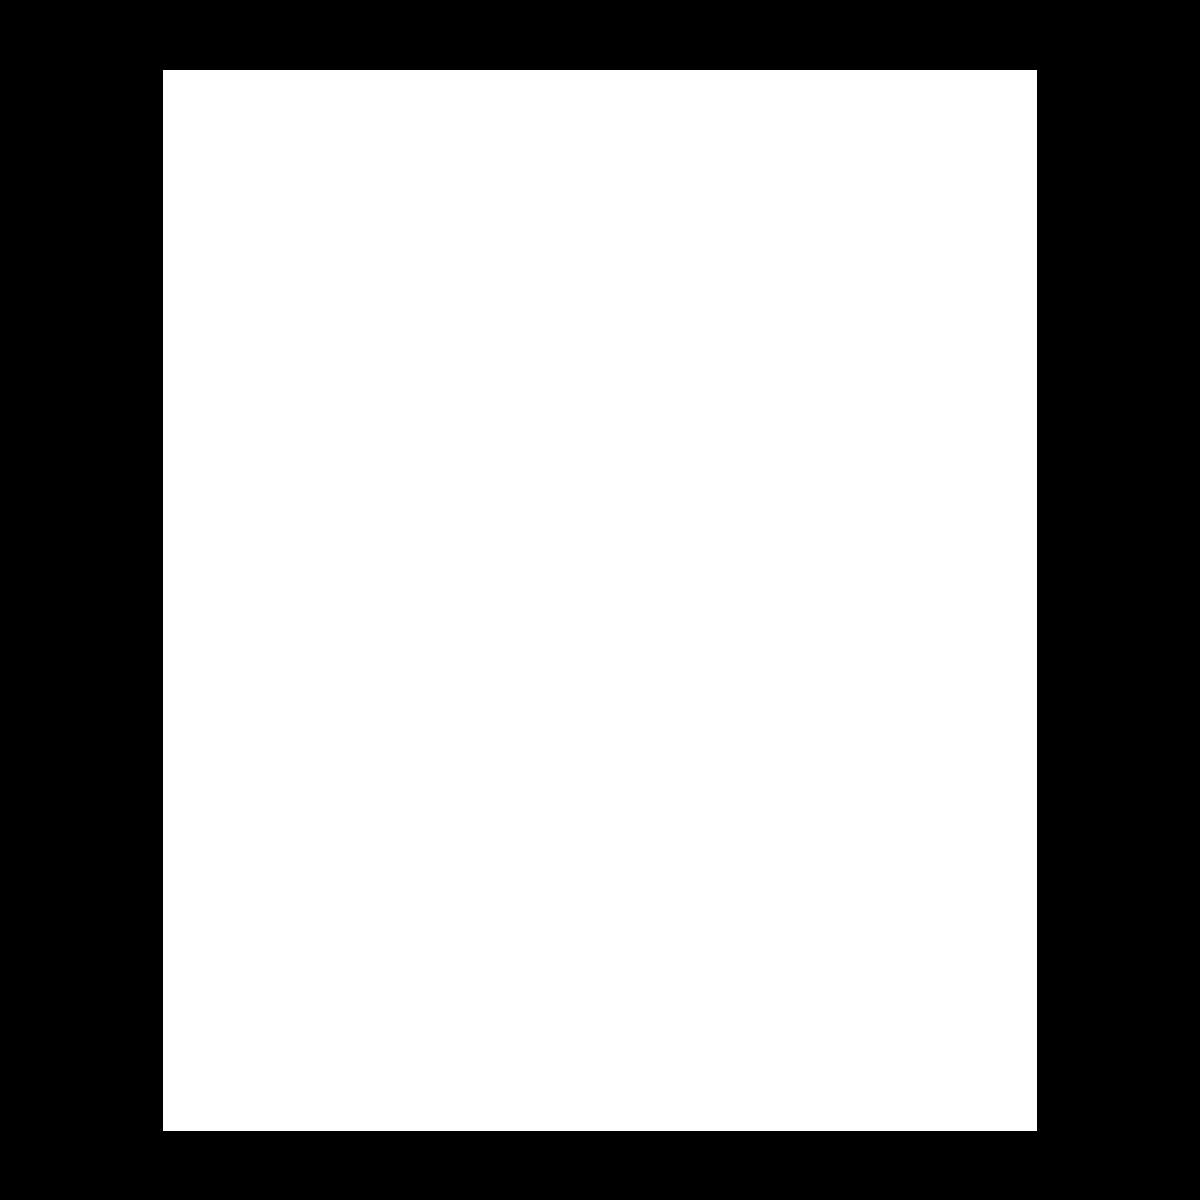 Wonolo, Pinch Client